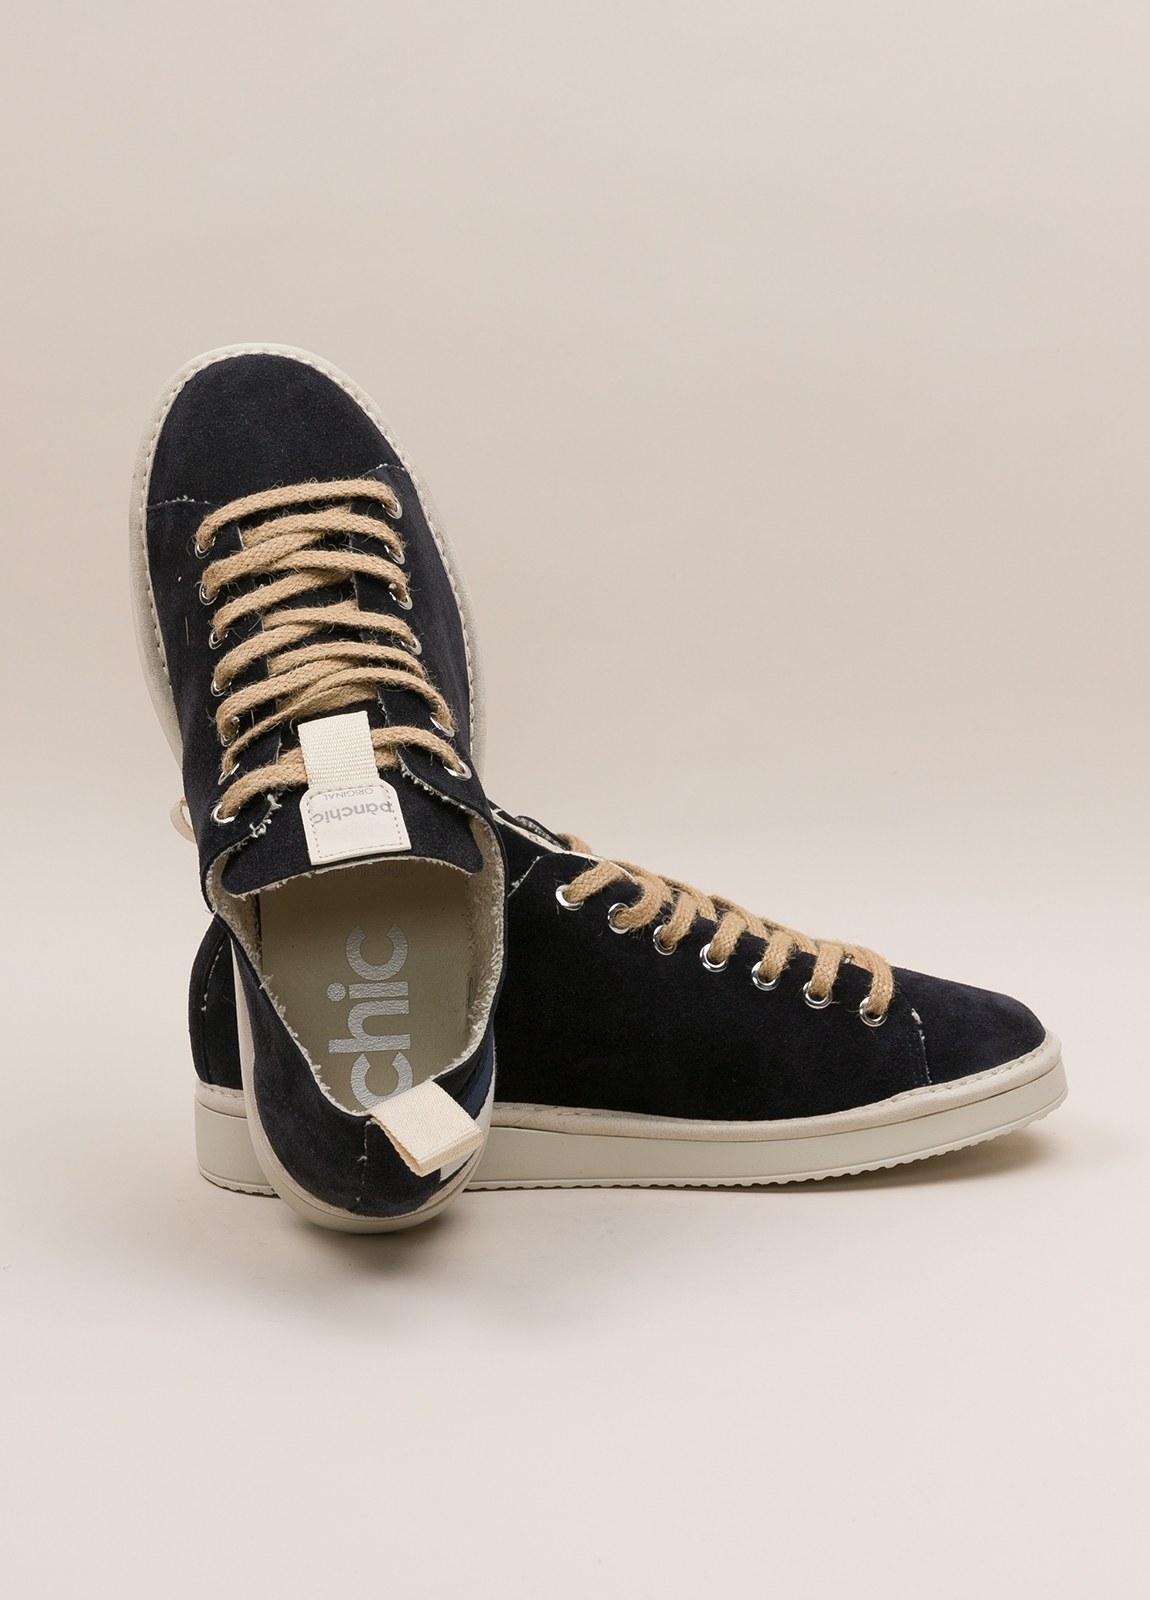 Sneakers PANCHIC marino - Ítem3